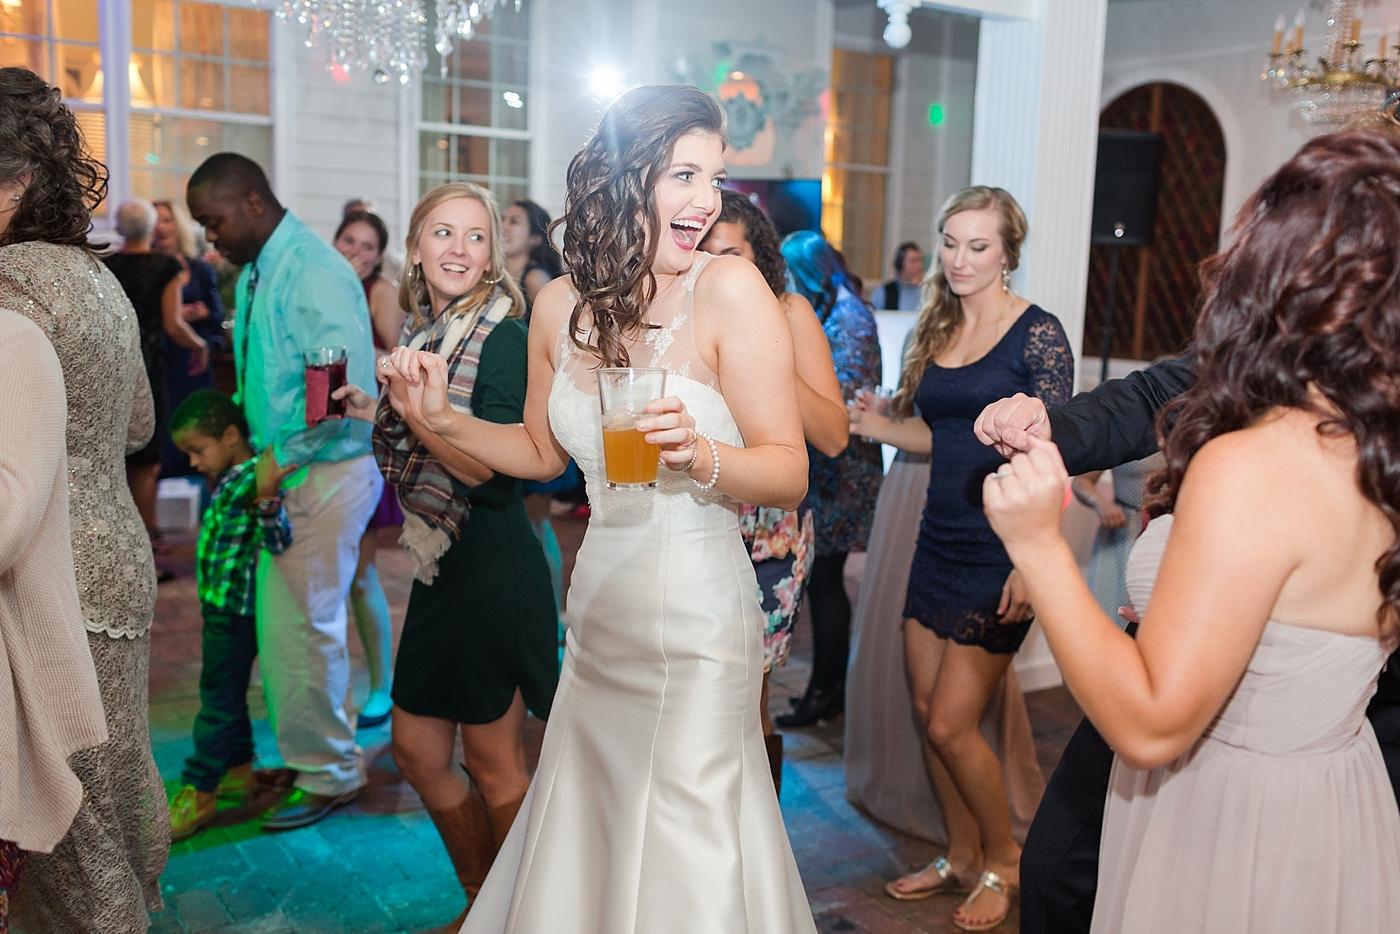 greenville-nc-wedding-the-robins-nest_82.jpg